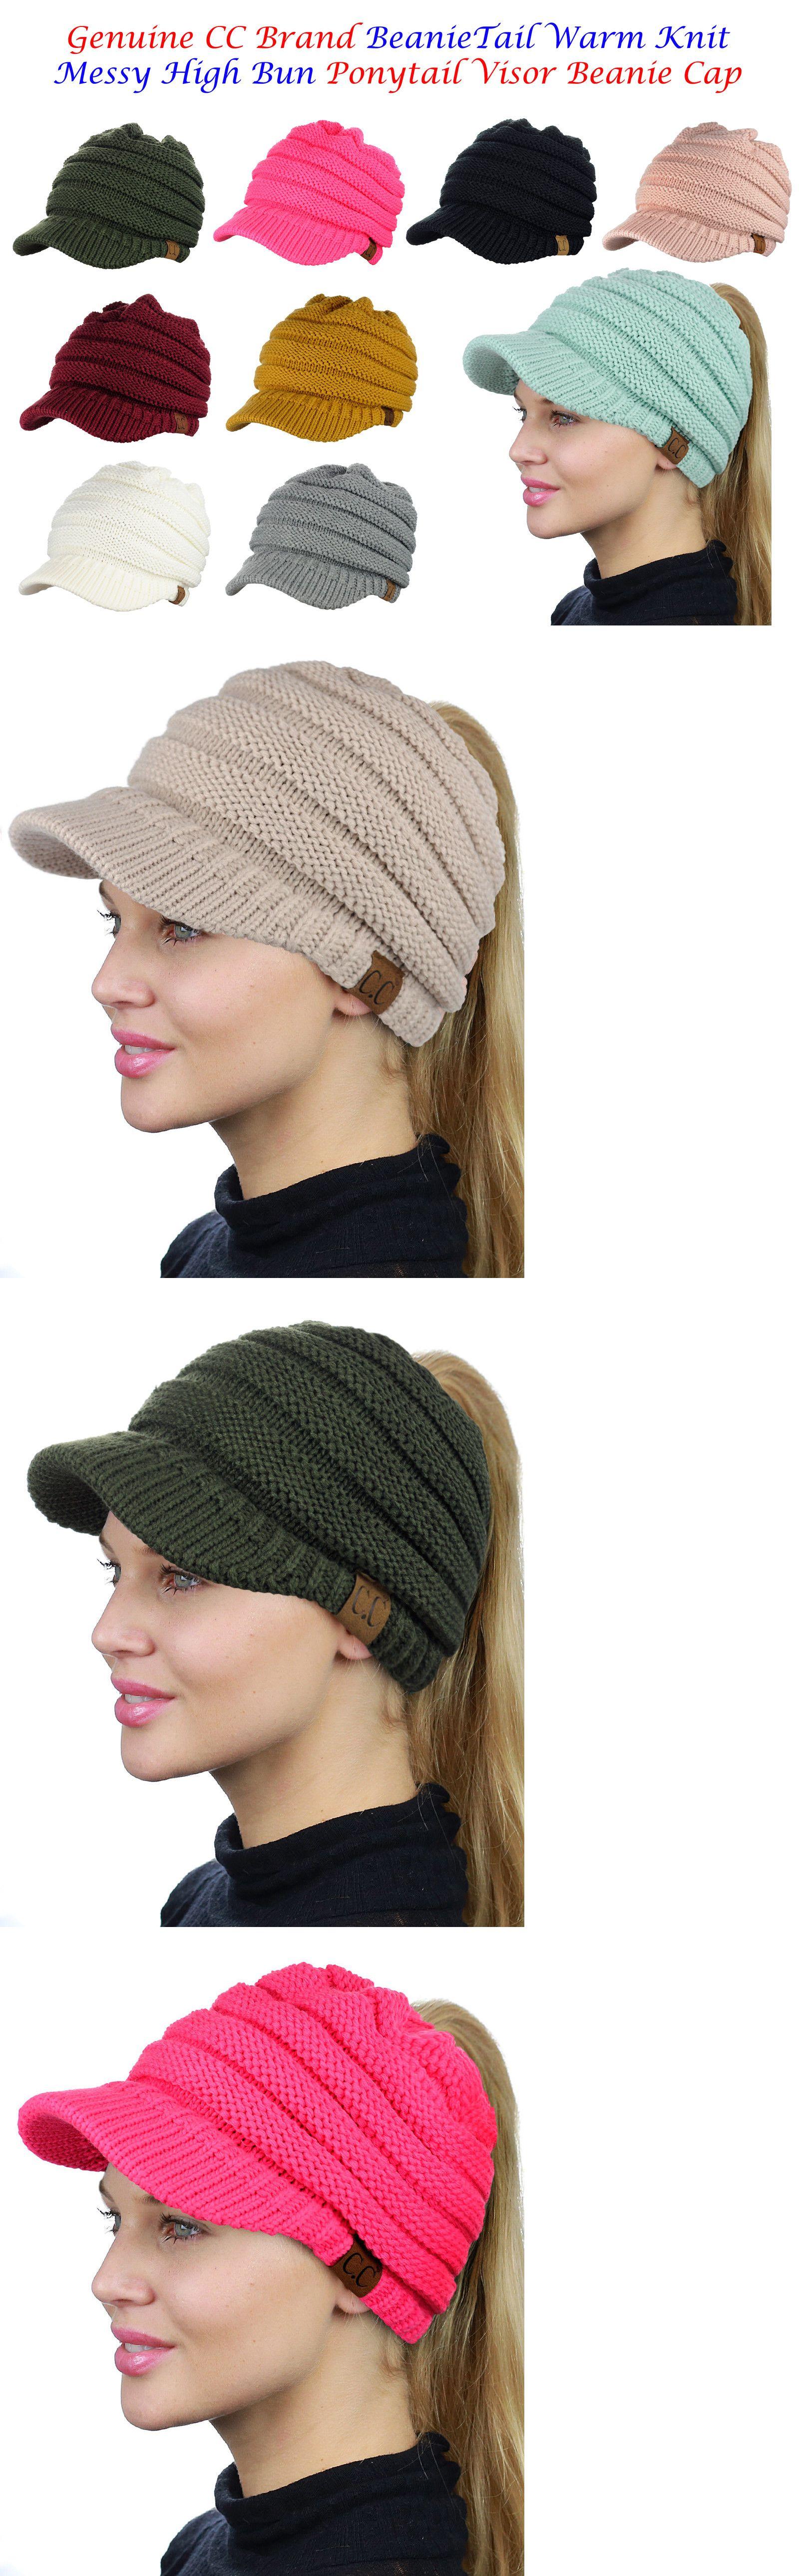 c3b5029c453 Hats 45230  New! Cc Beanietail Warm Knit Messy High Bun Visor Cc Ponytail  Beanie Cap -  BUY IT NOW ONLY   15.99 on  eBay  beanietail  messy  visor   ponytail ...